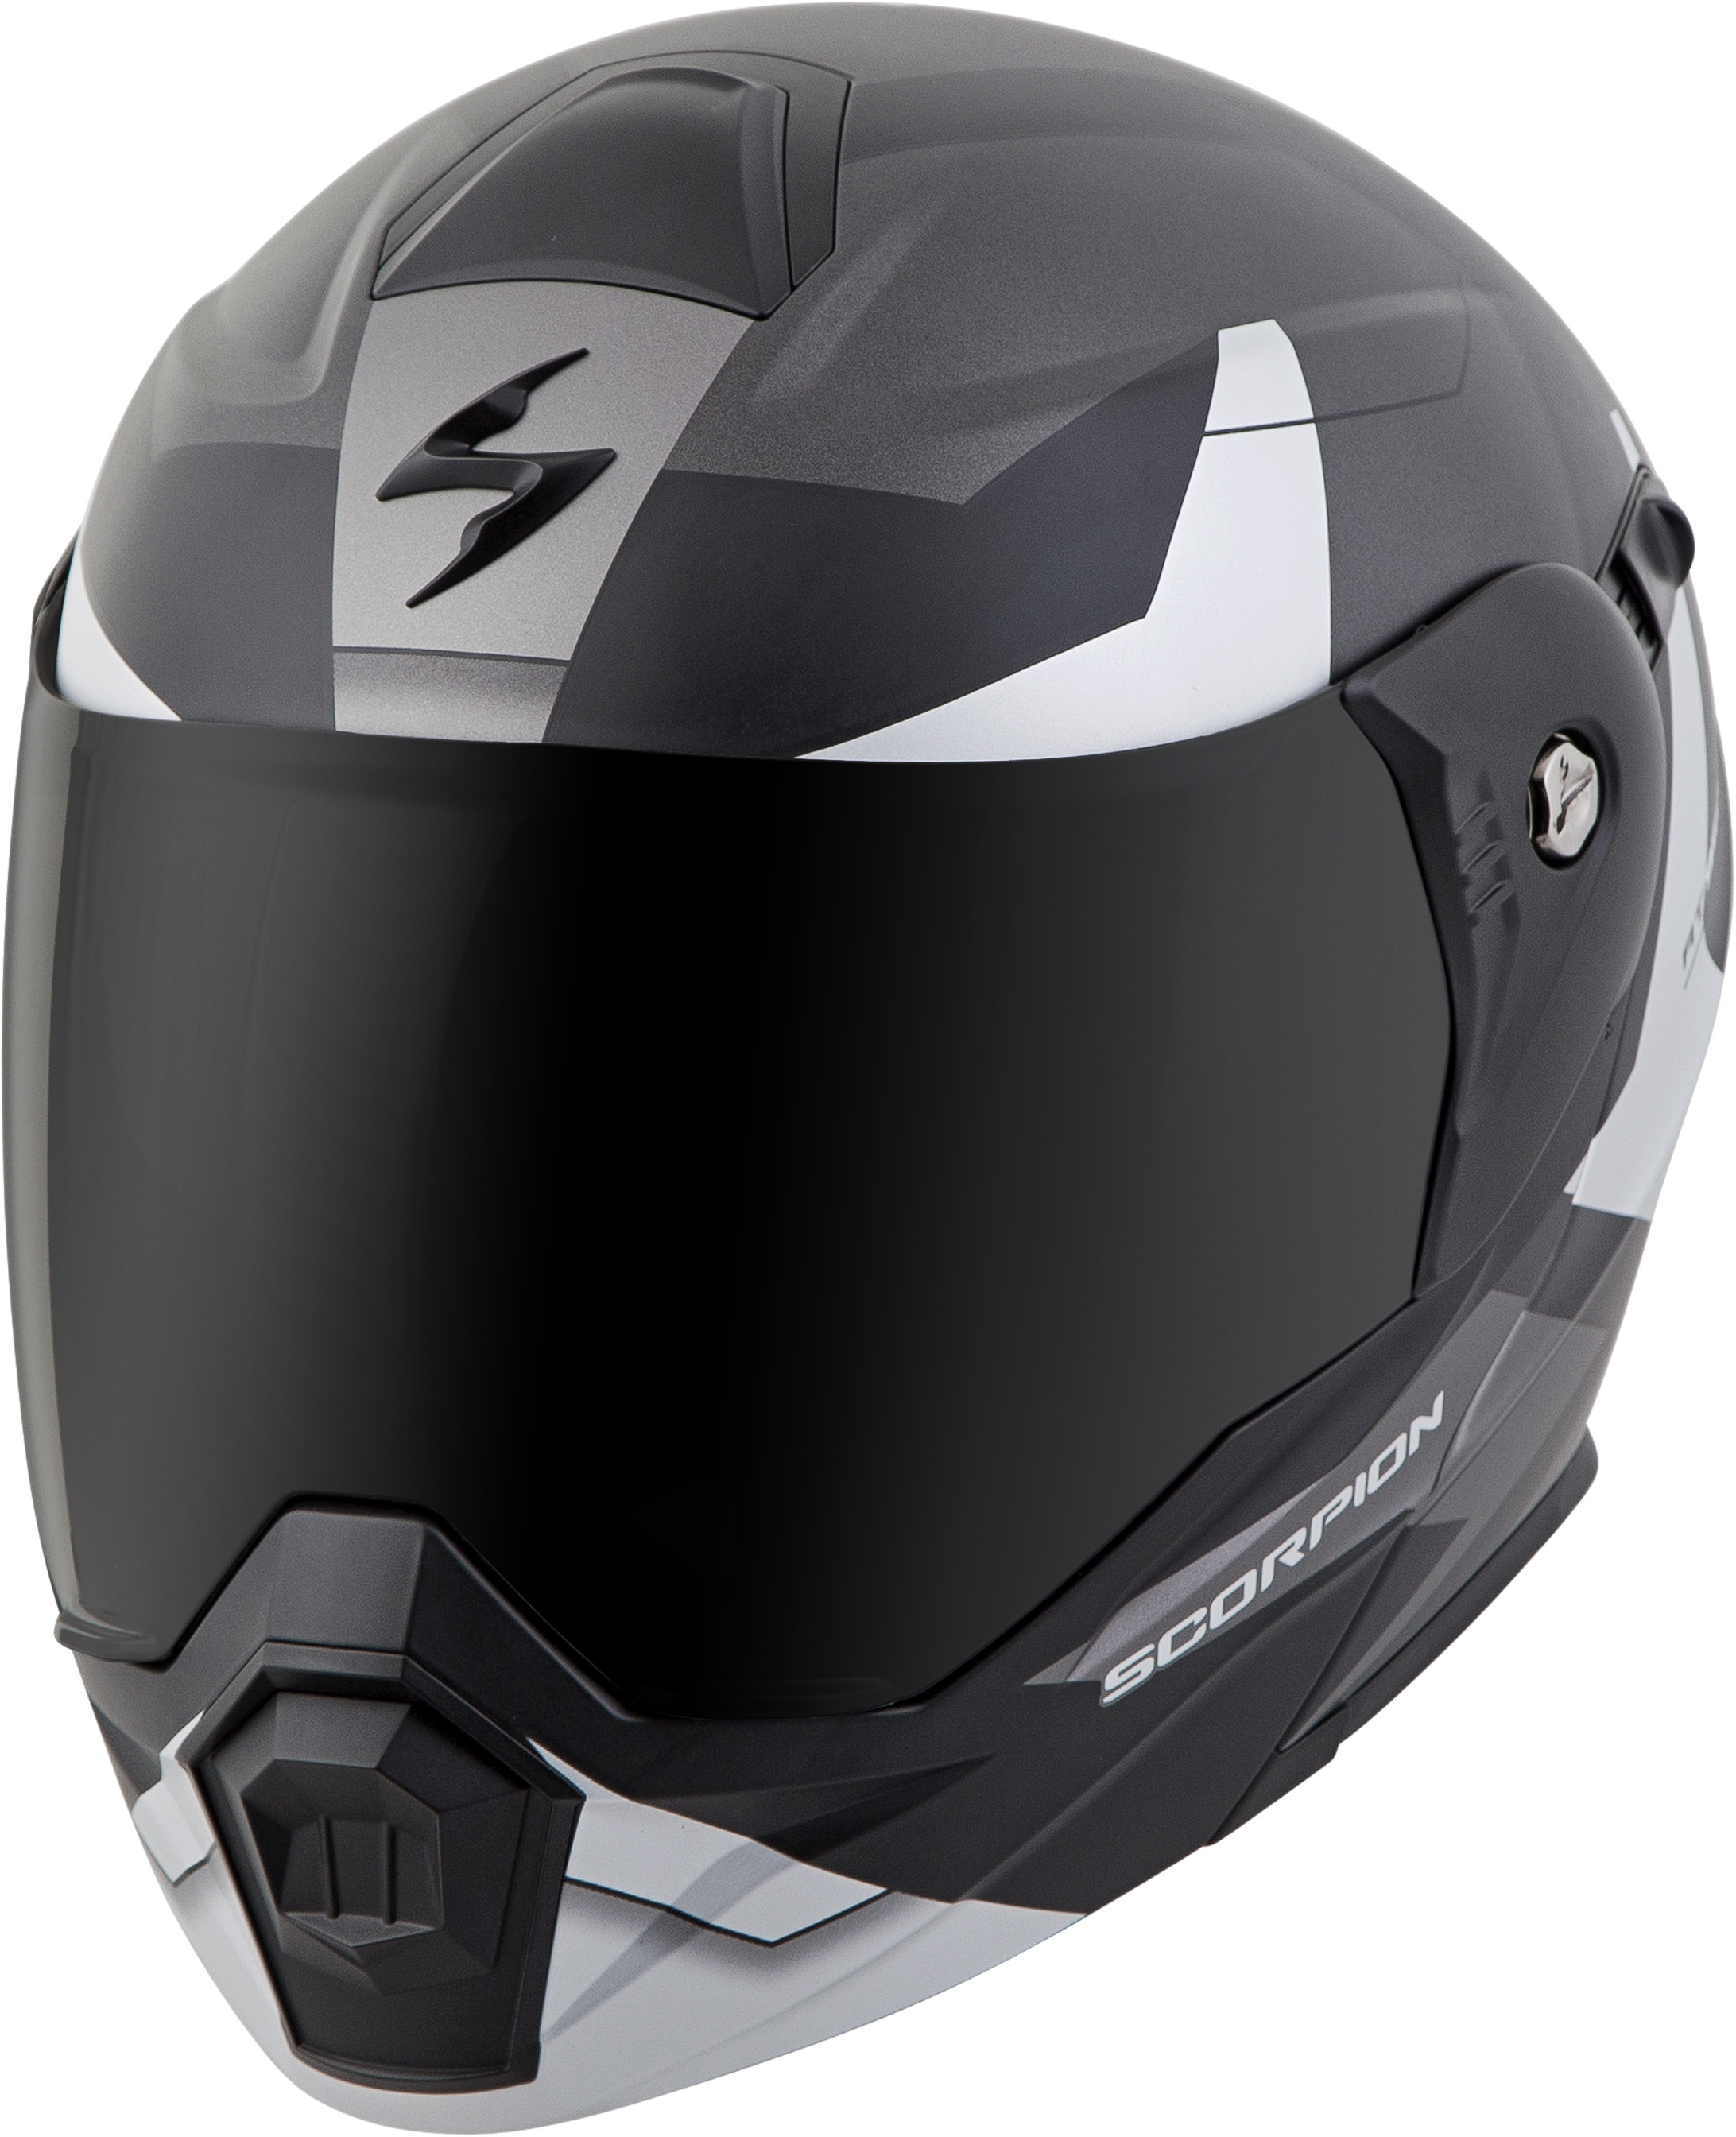 for-Scorpion-Helmet-EXO-AT950-Neocon-Snow-Helmet-with-Dual-Lens-Shield miniature 24